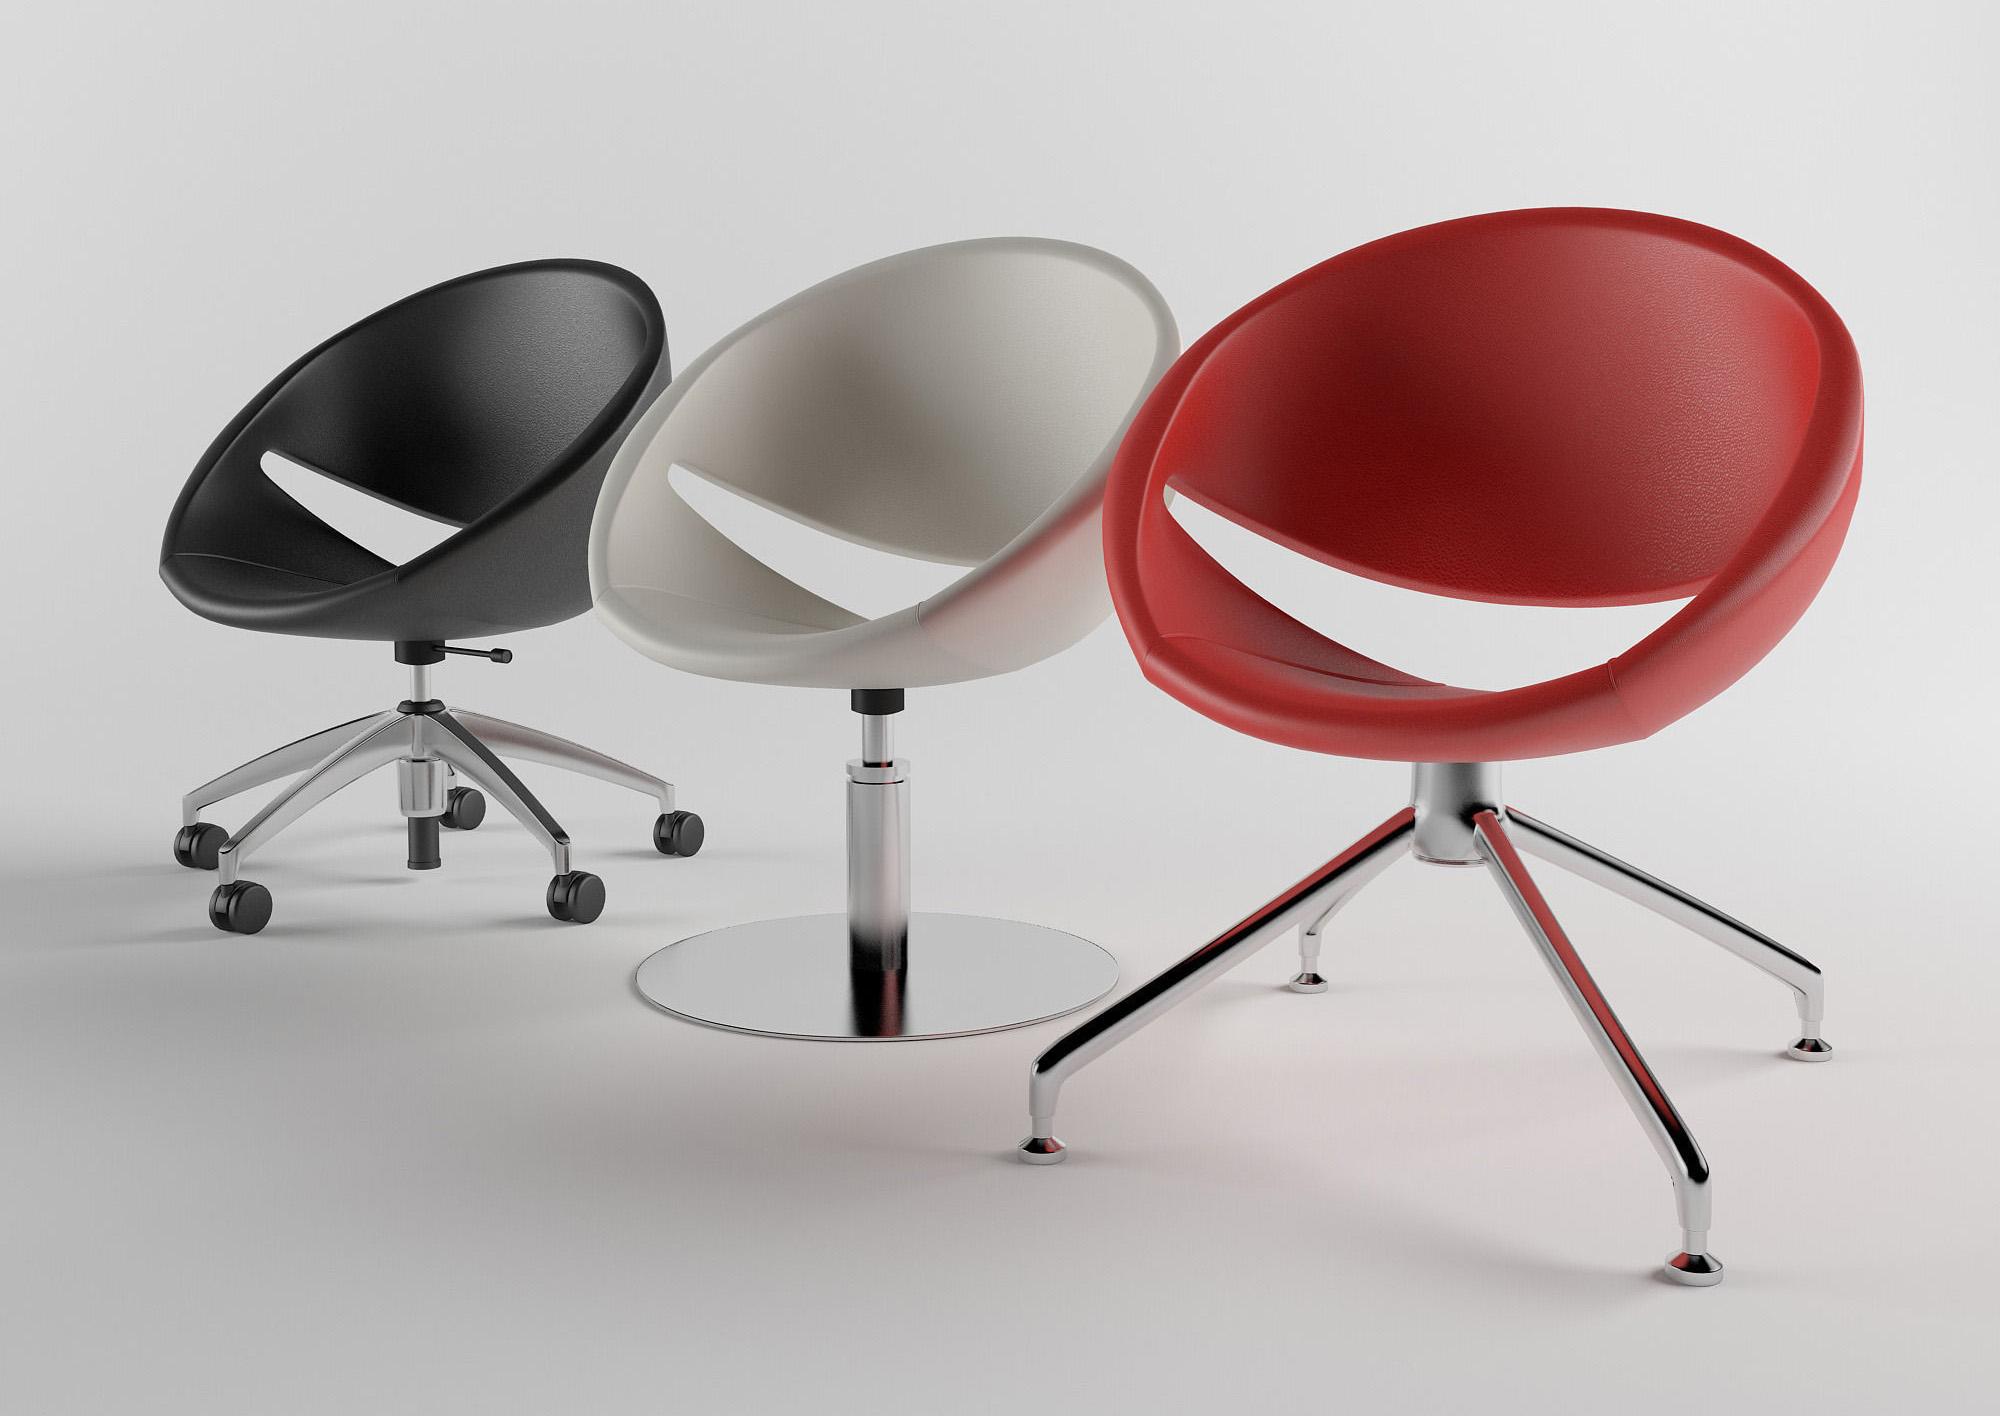 armchair-ares-line-mya-metting-3d-model-max-obj-3ds-fbx-mtl